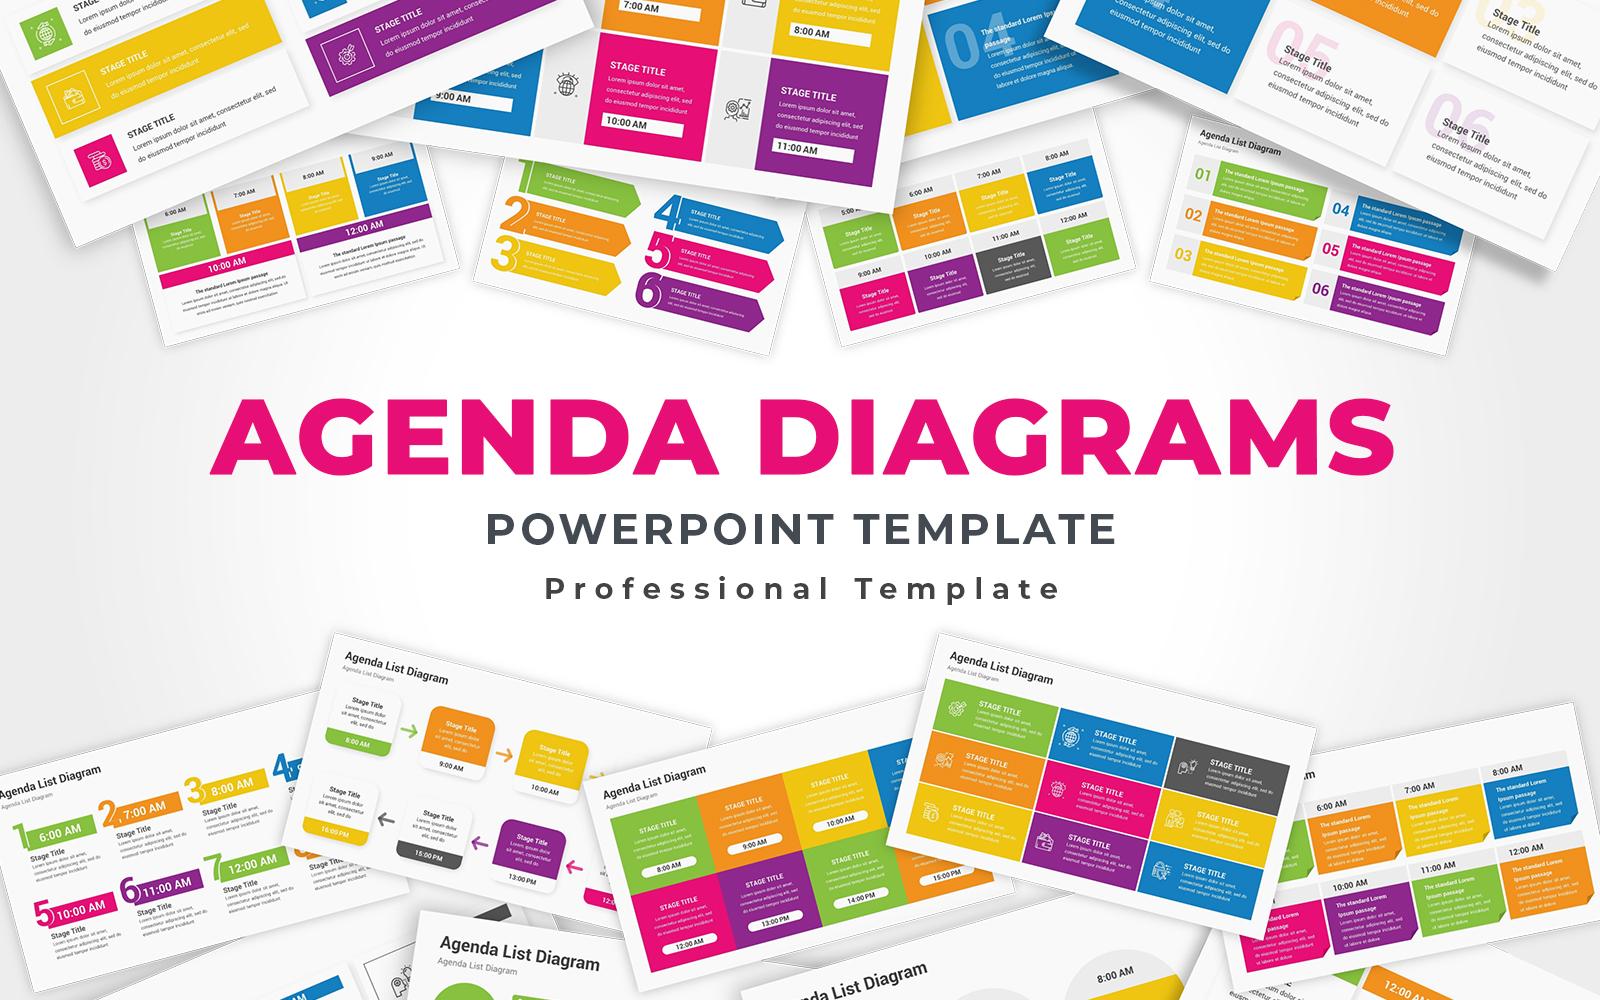 Agenda diagrams PowerPoint template